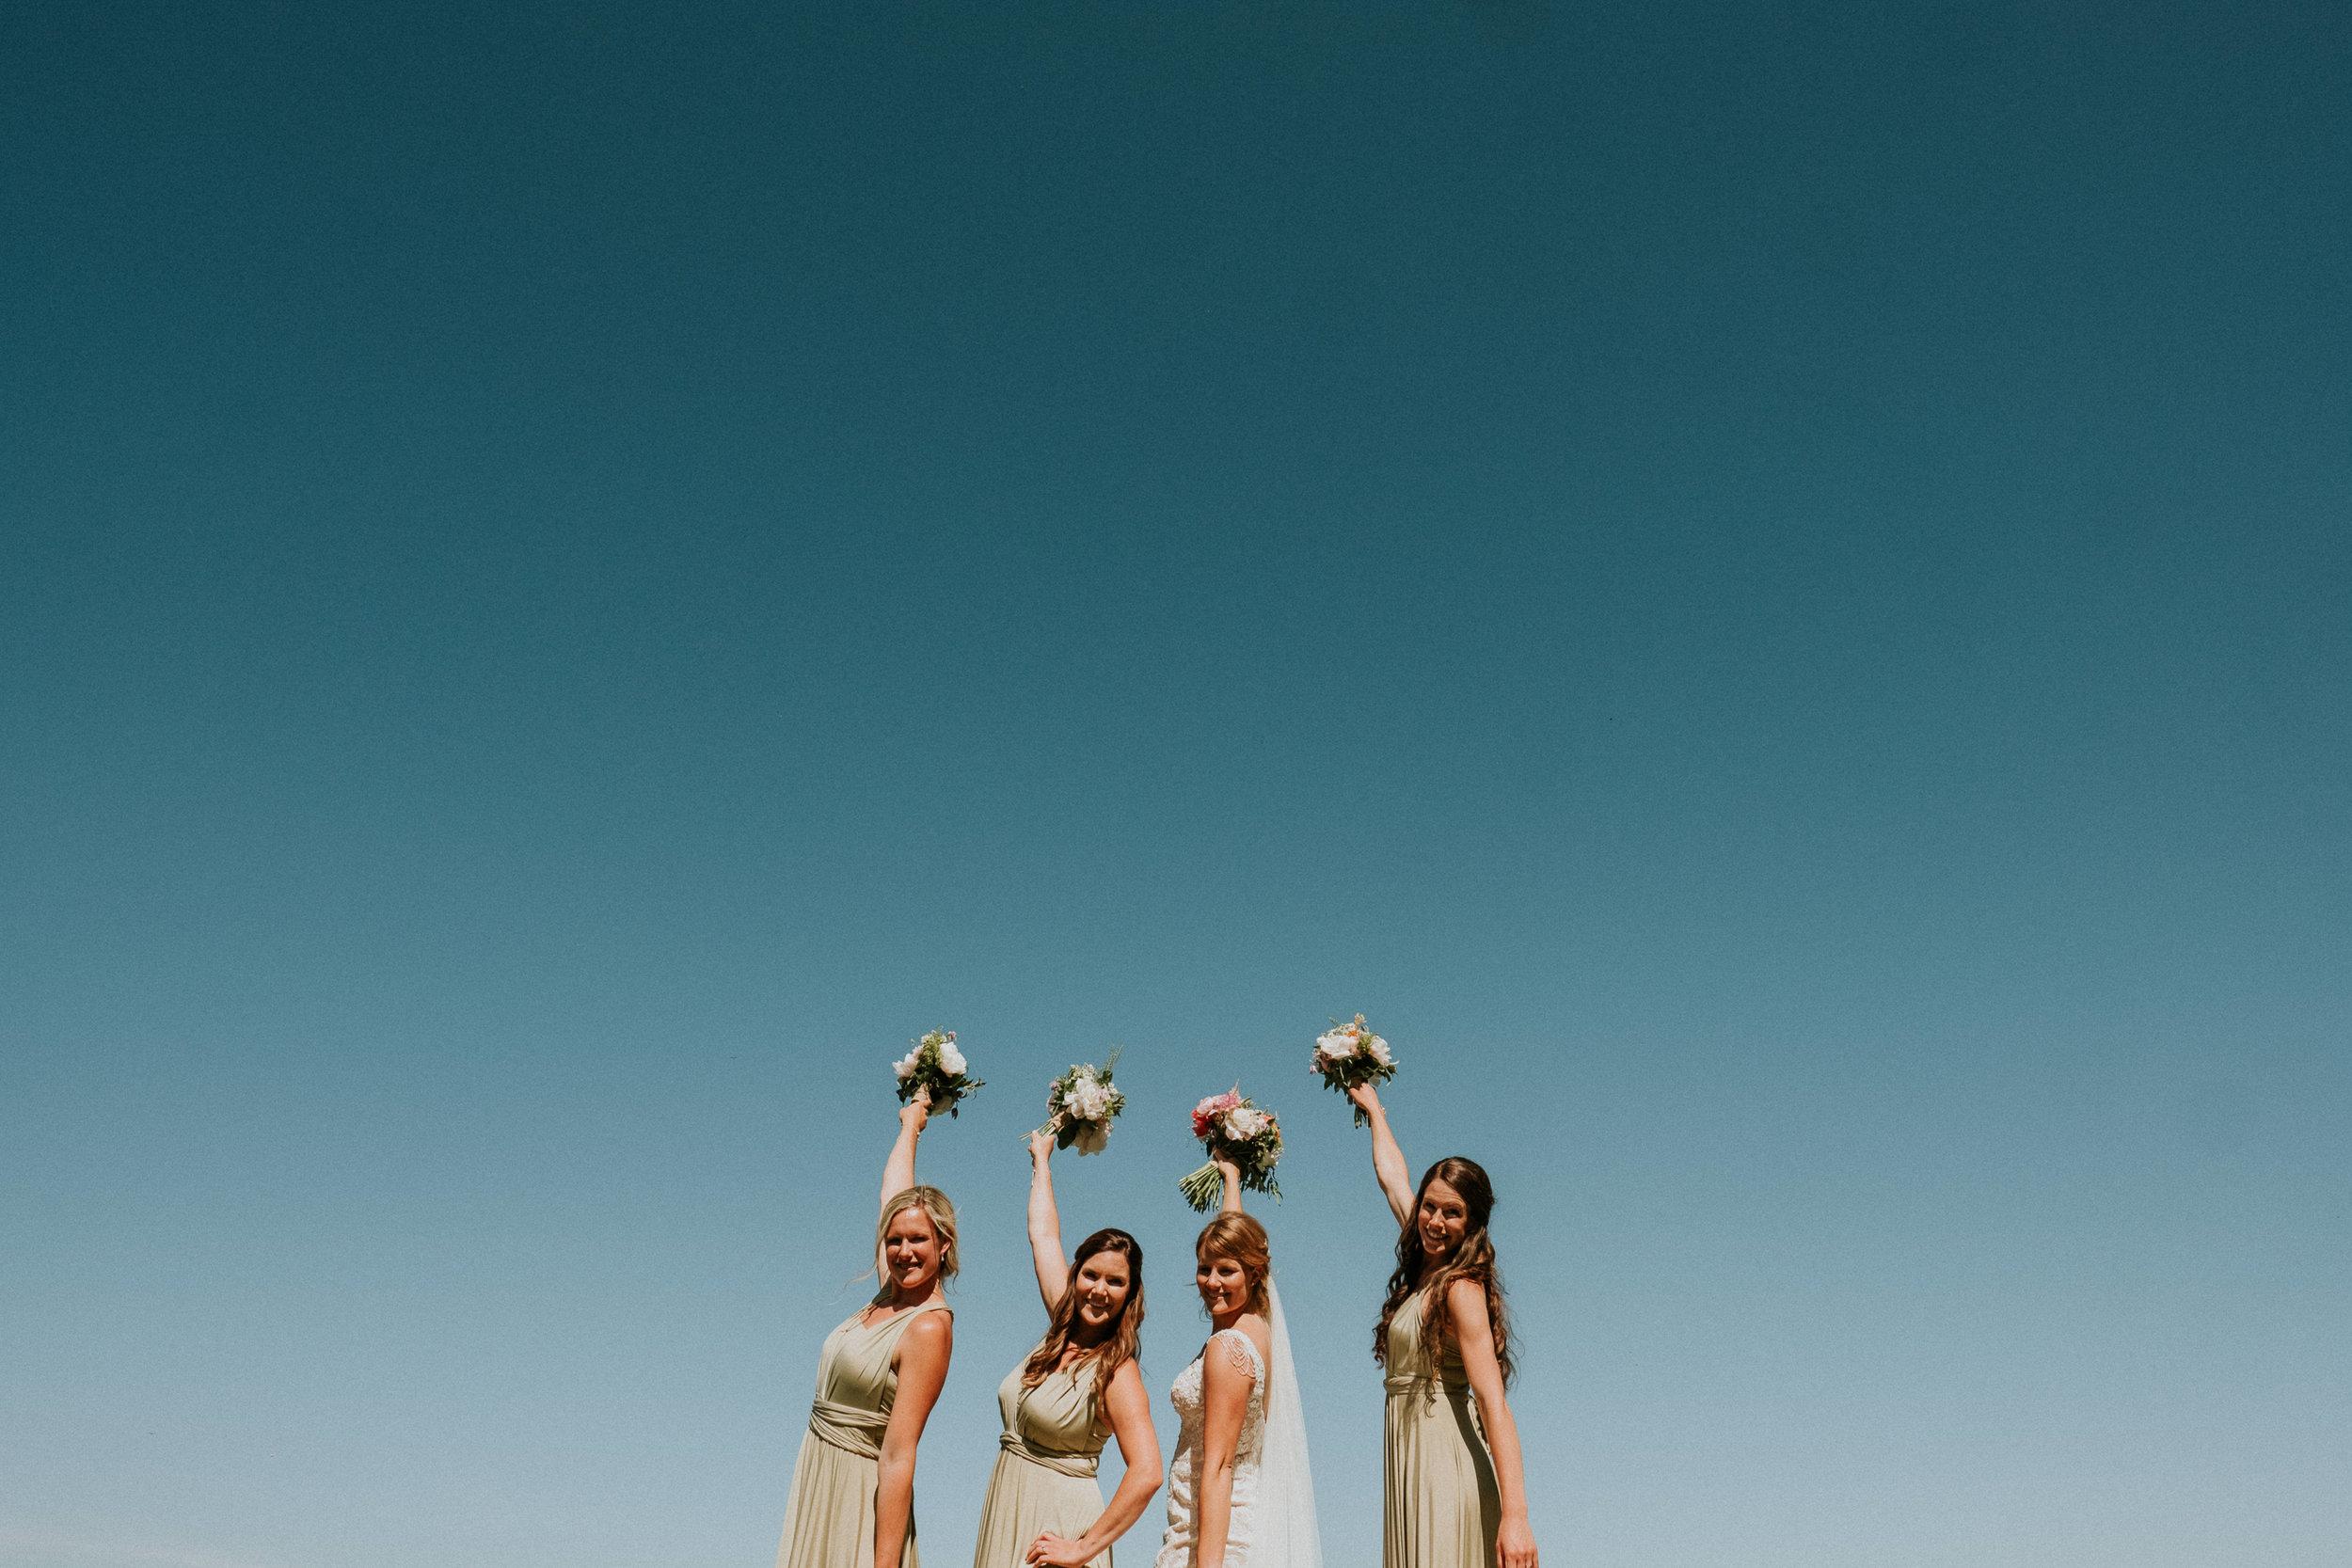 19 Southend Barns wedding photography Sussex creative fun joanna nicole photography2.jpg